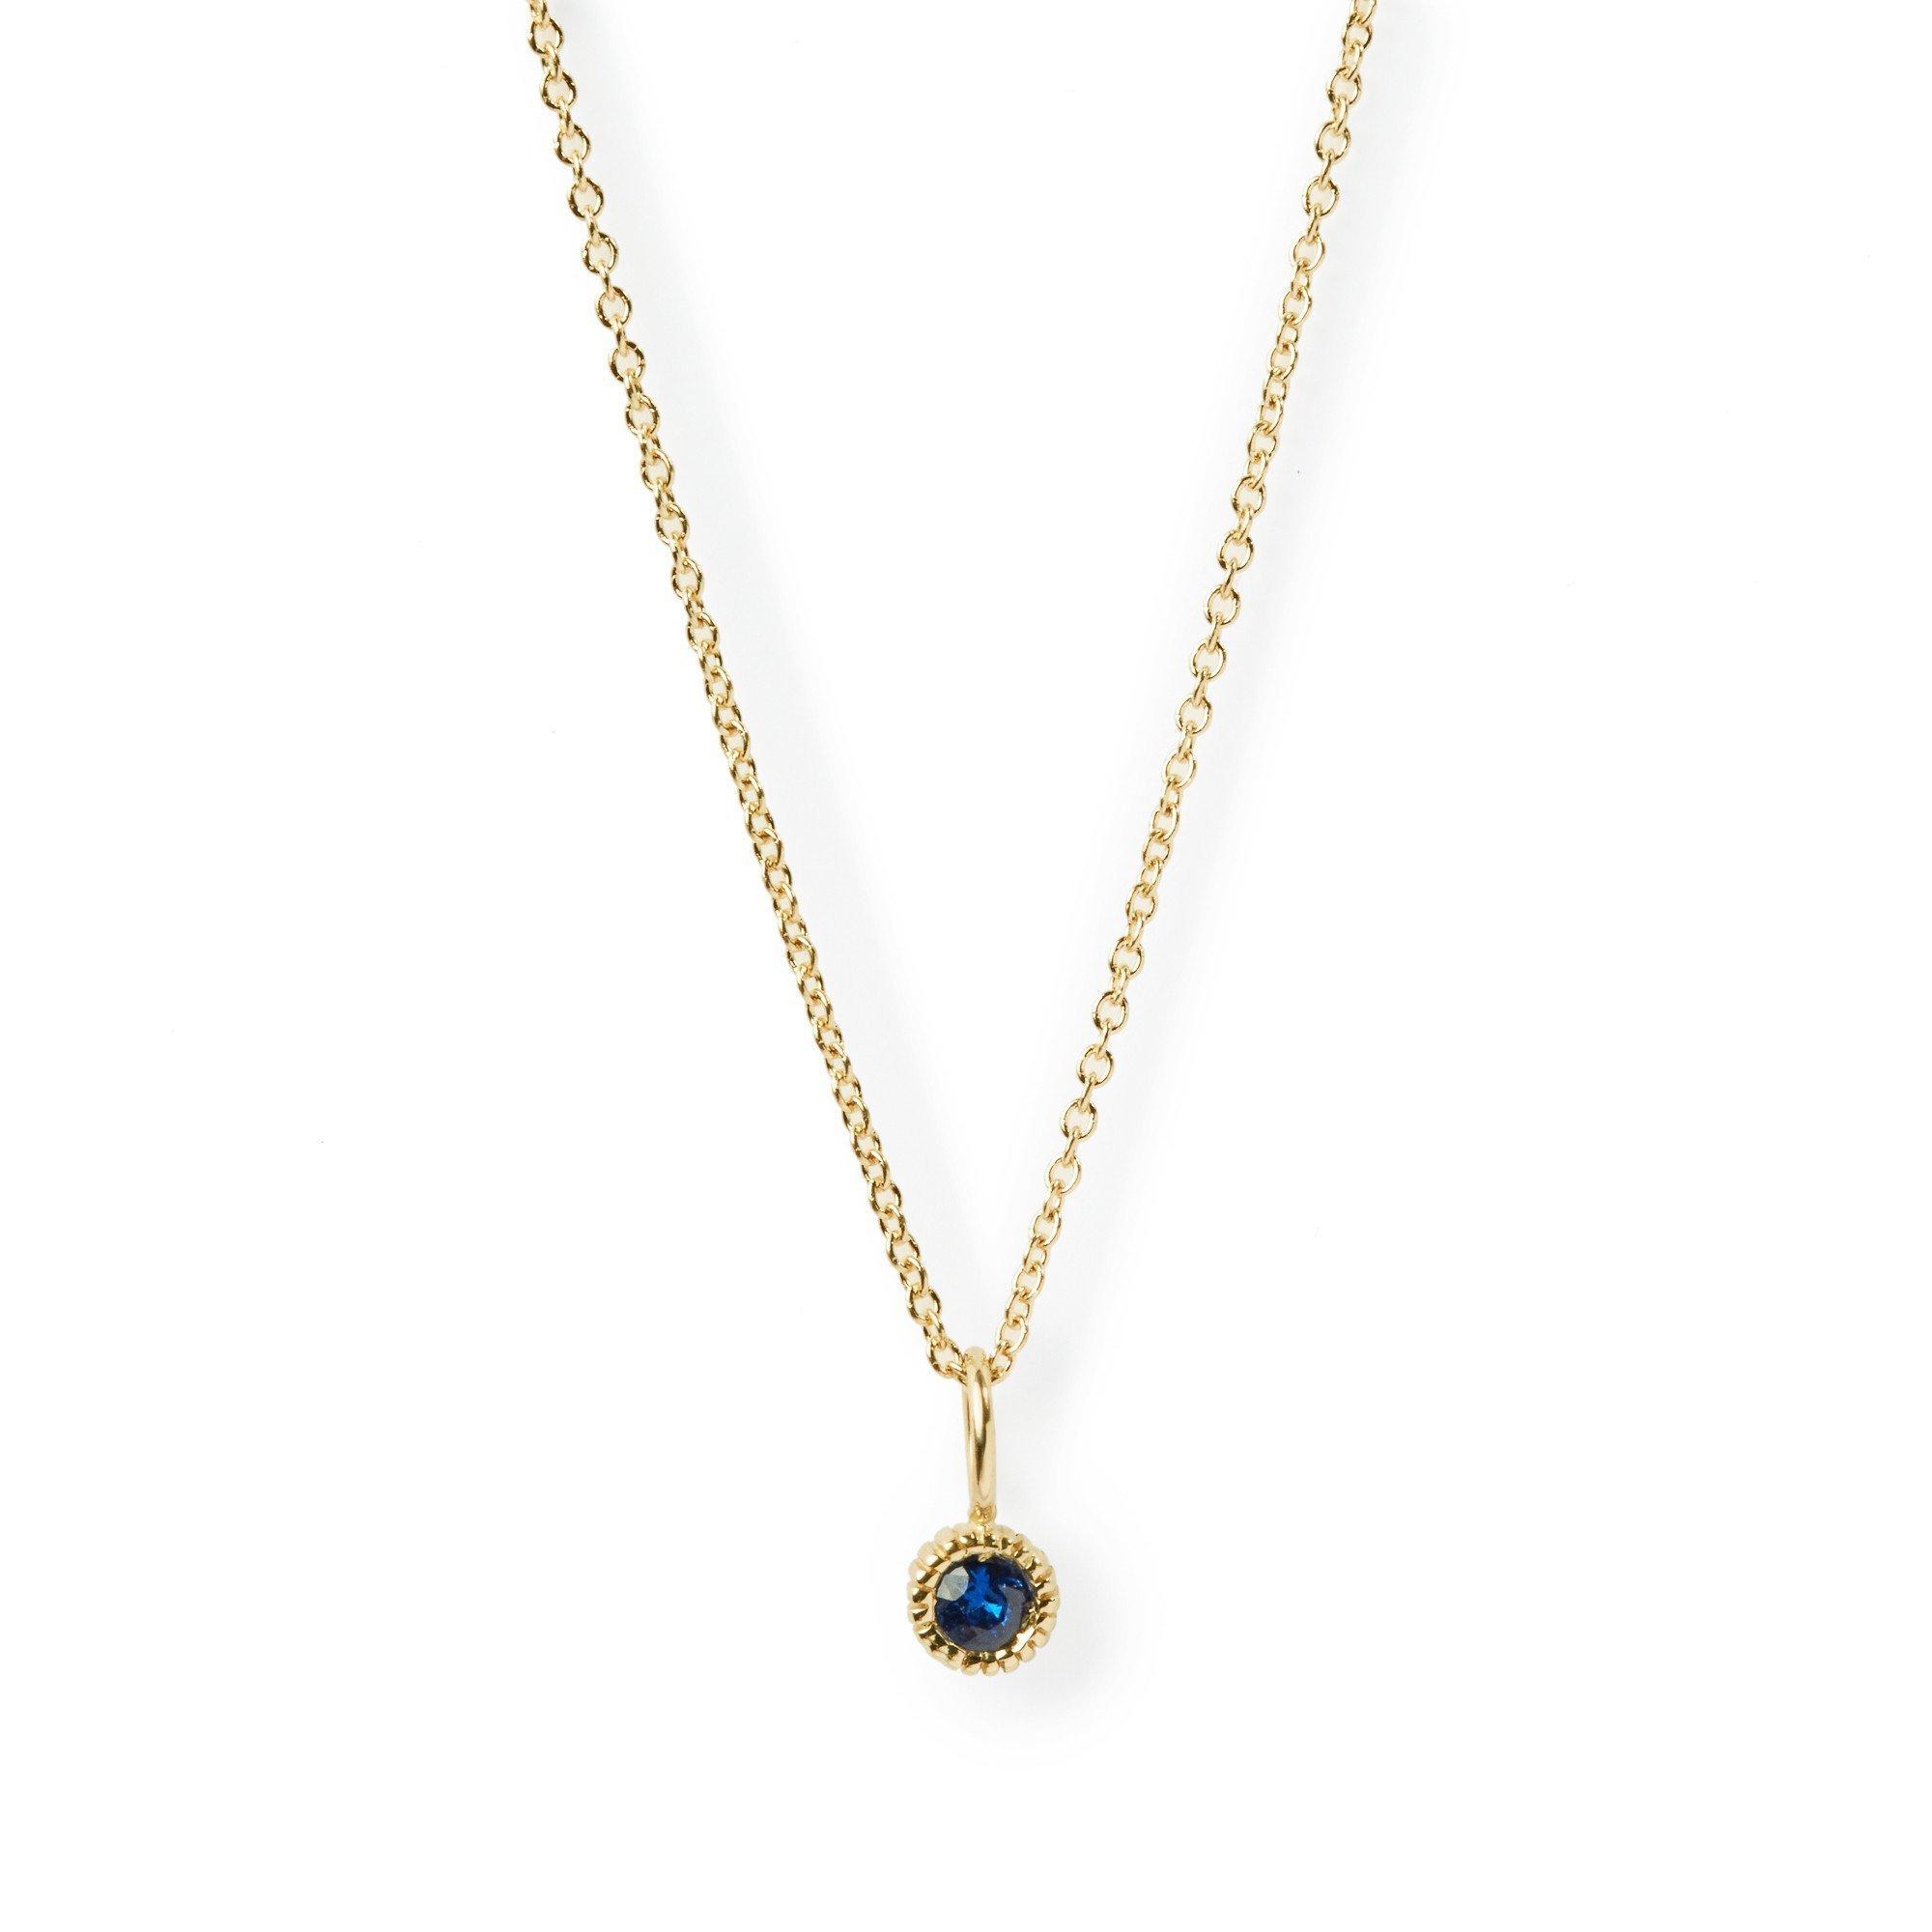 Elizabeth Buenaventura - Youth Sapphire Charm Necklace